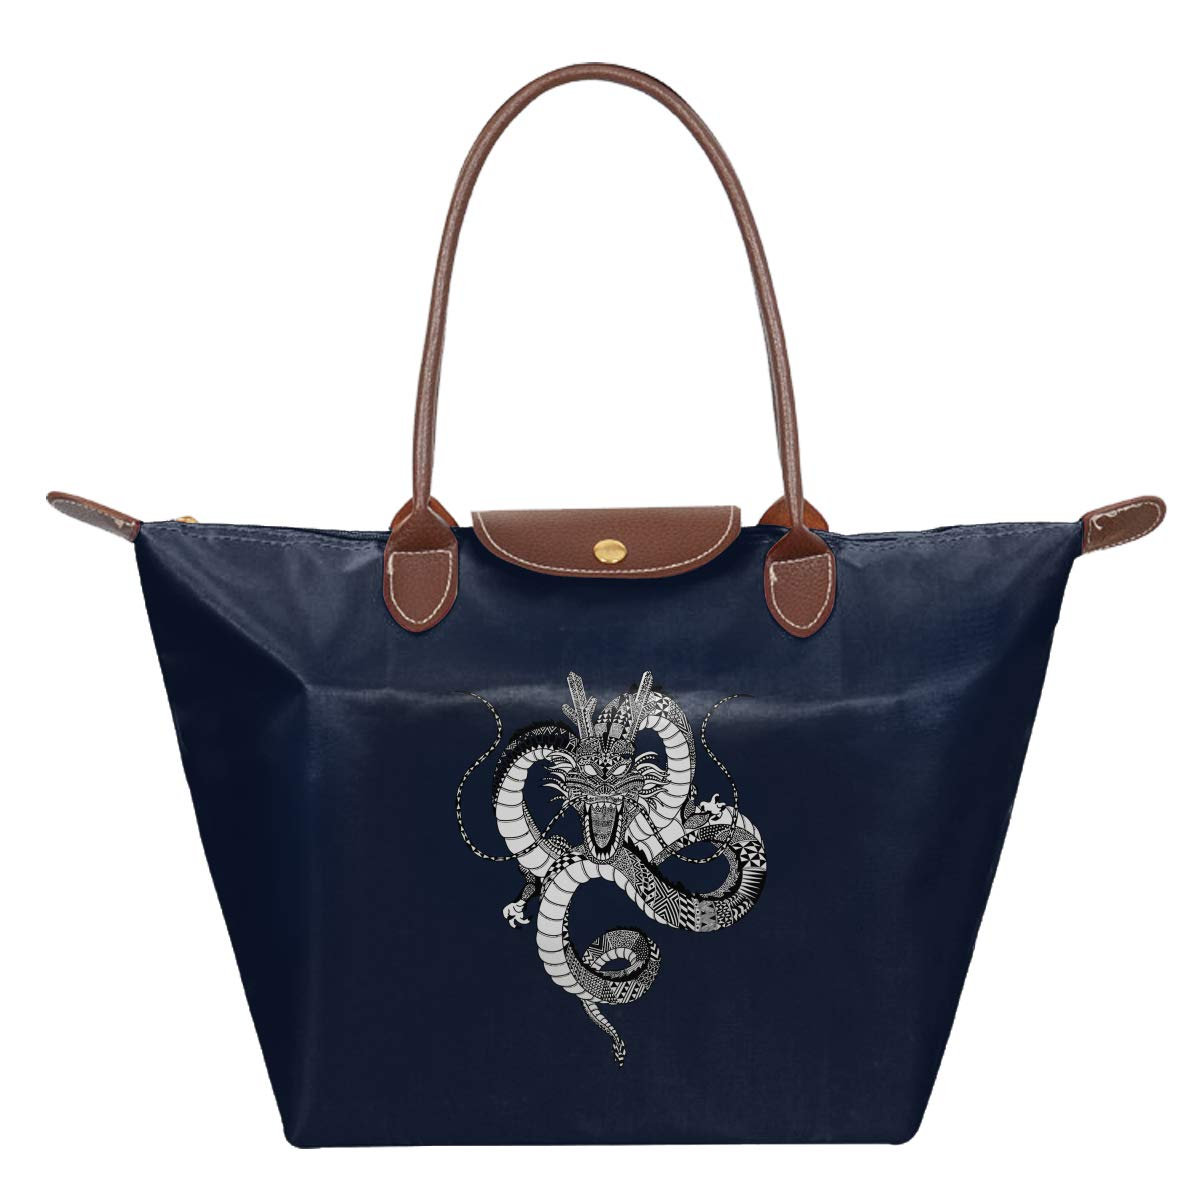 Aztec Dragon Shenron Dragon Ball Z Waterproof Leather Folded Messenger Nylon Bag Travel Tote Hopping Folding School Handbags